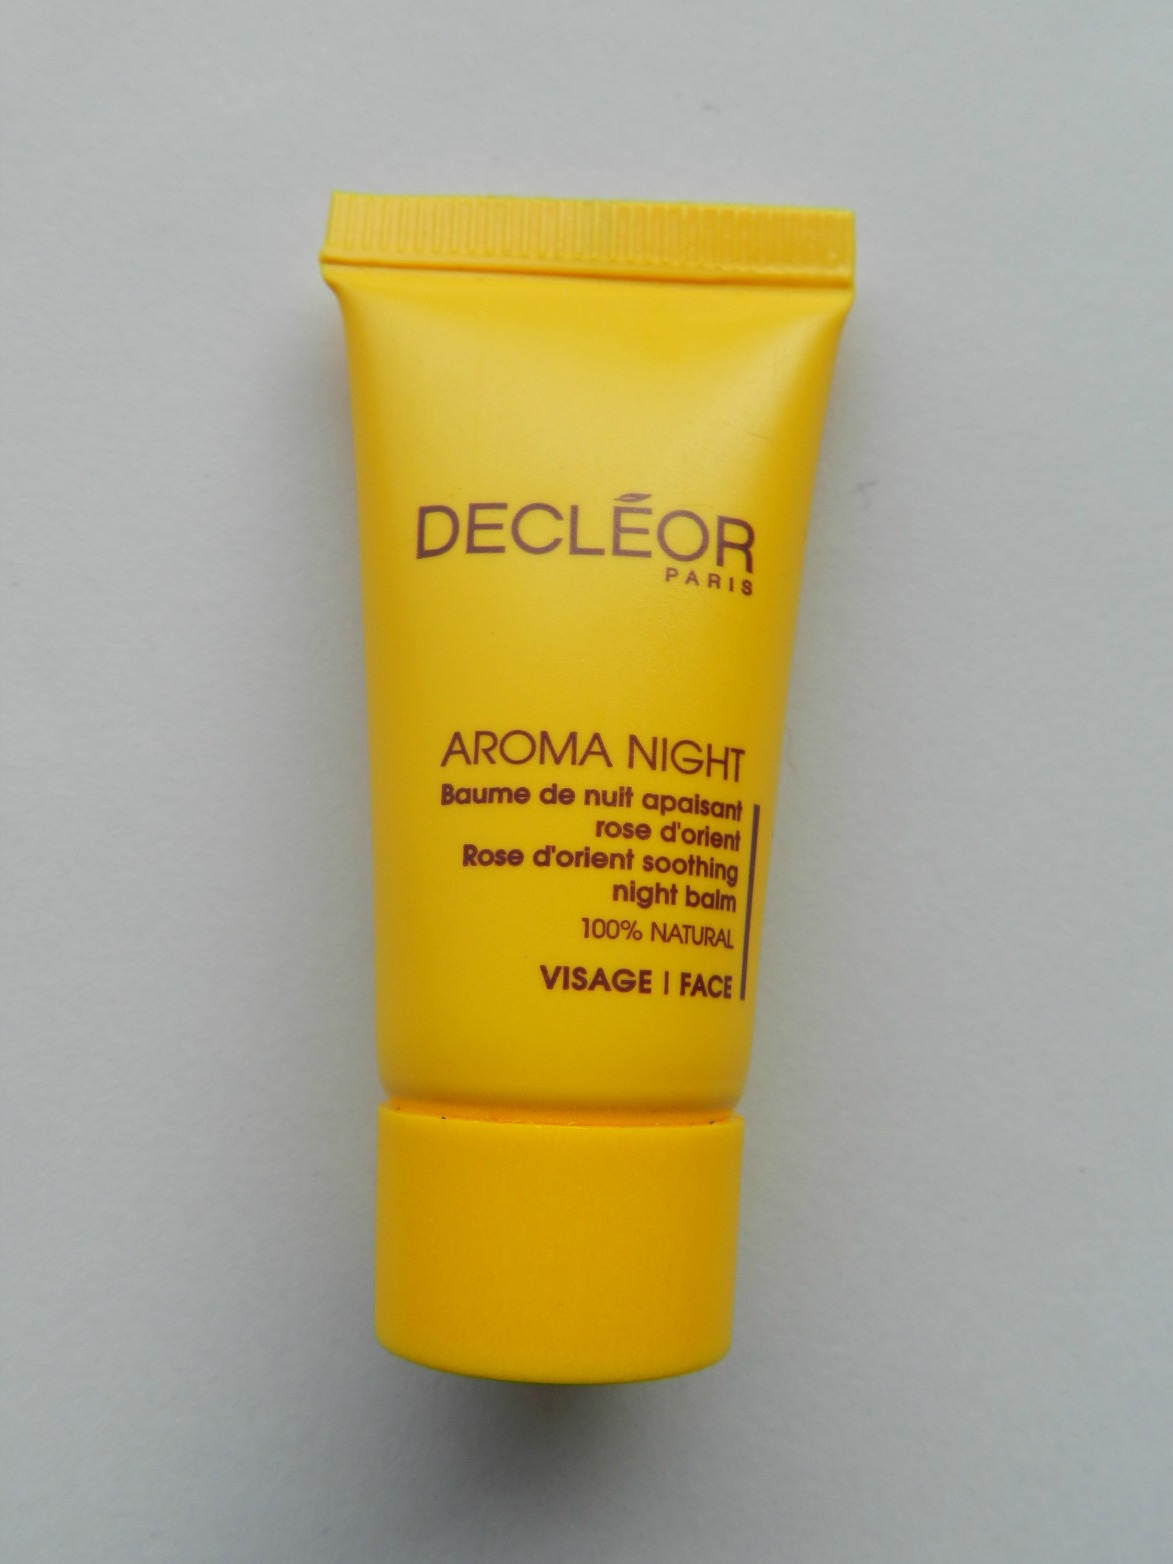 decleor aroma night